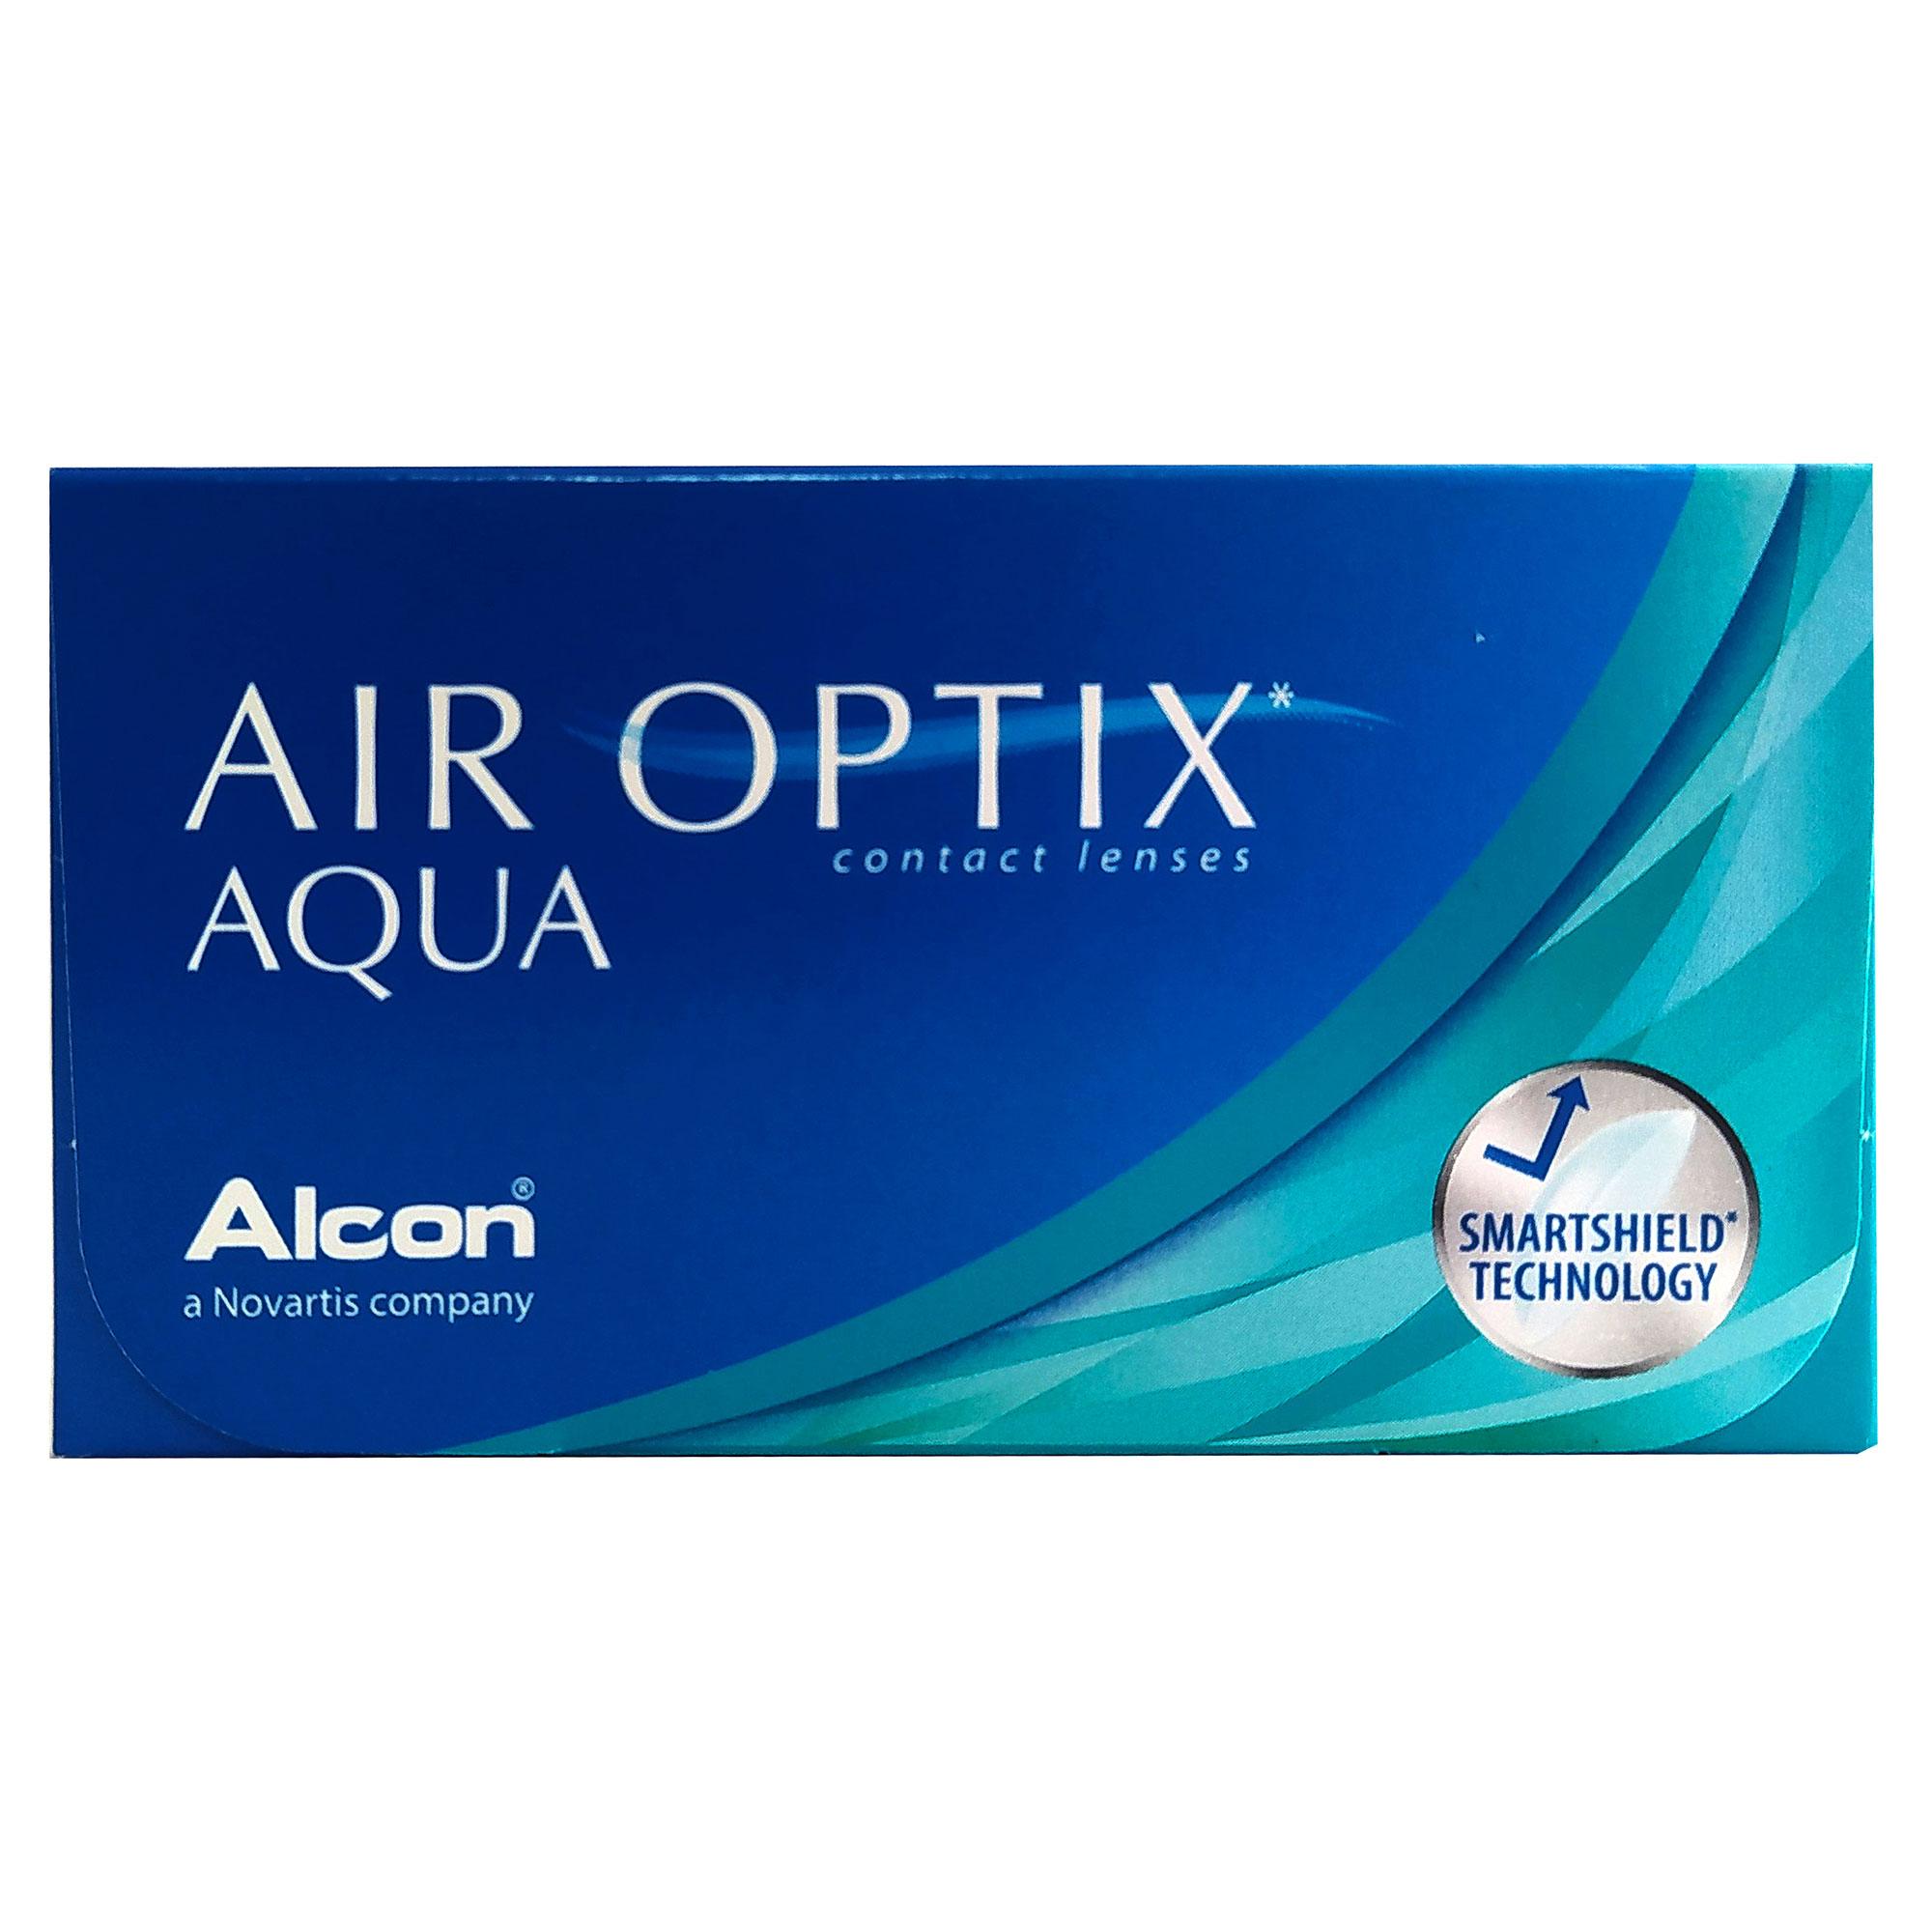 Kit com 2 caixas de Lentes Air Optix Aqua